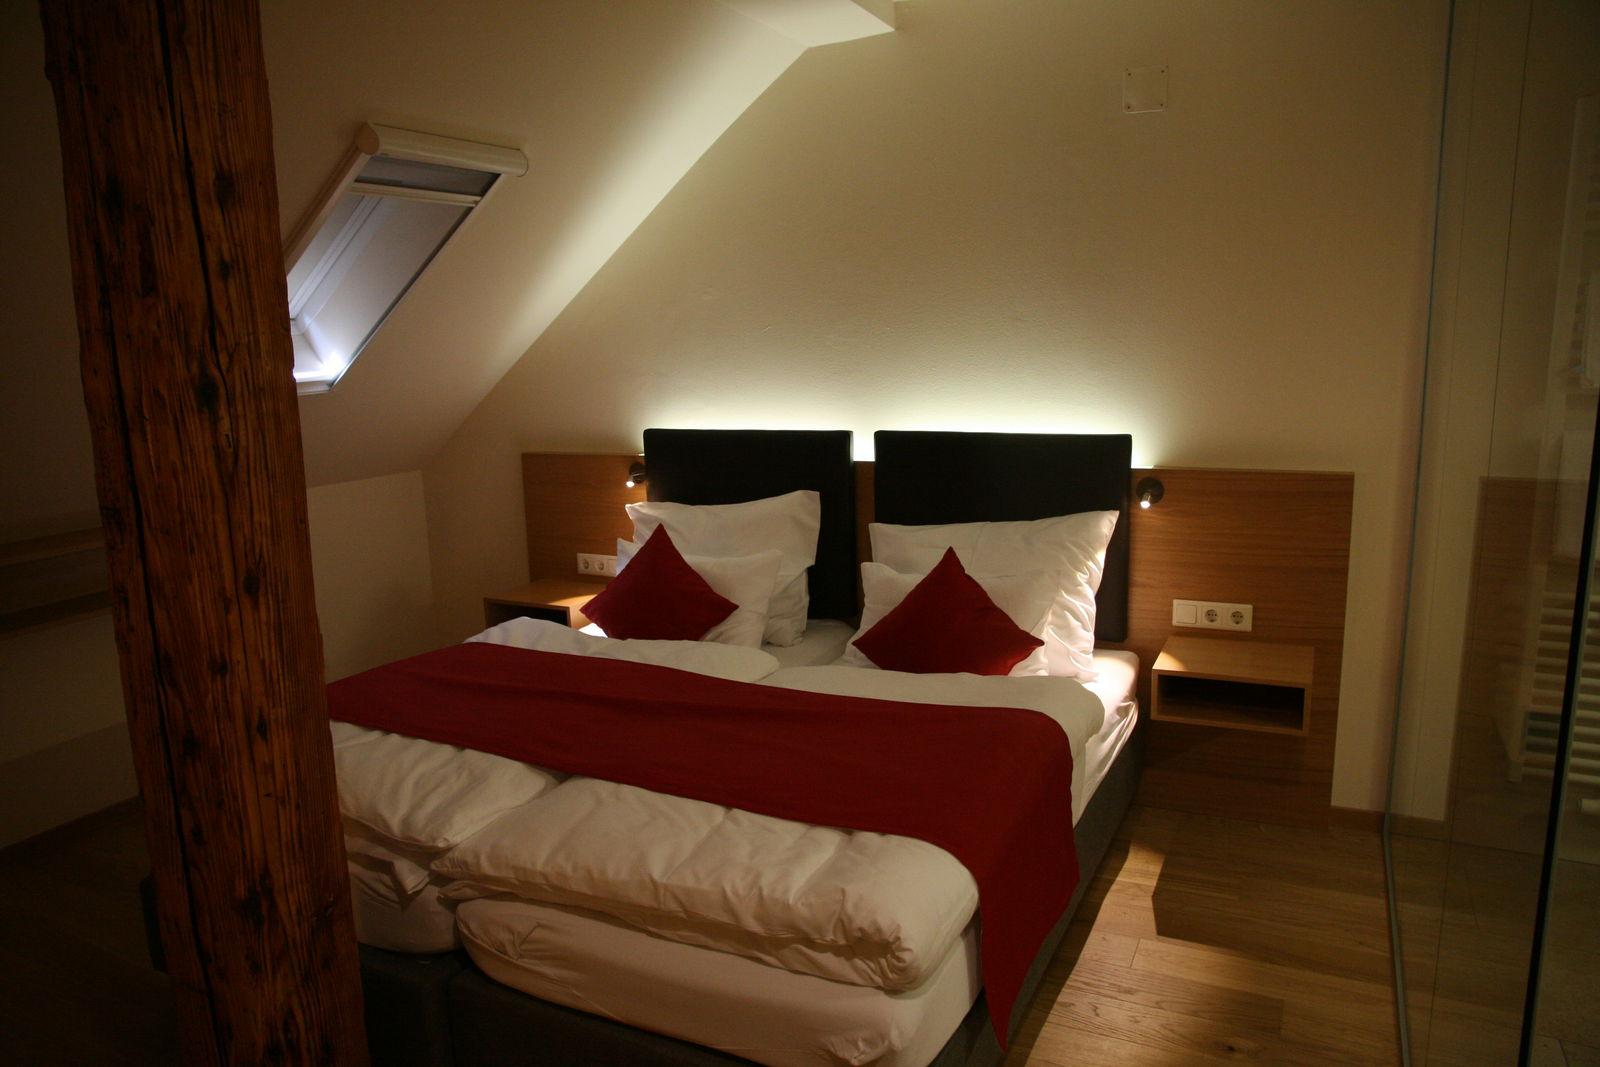 Awesome hotelzimmer design mit indirekter beleuchtung for Hotelzimmer design